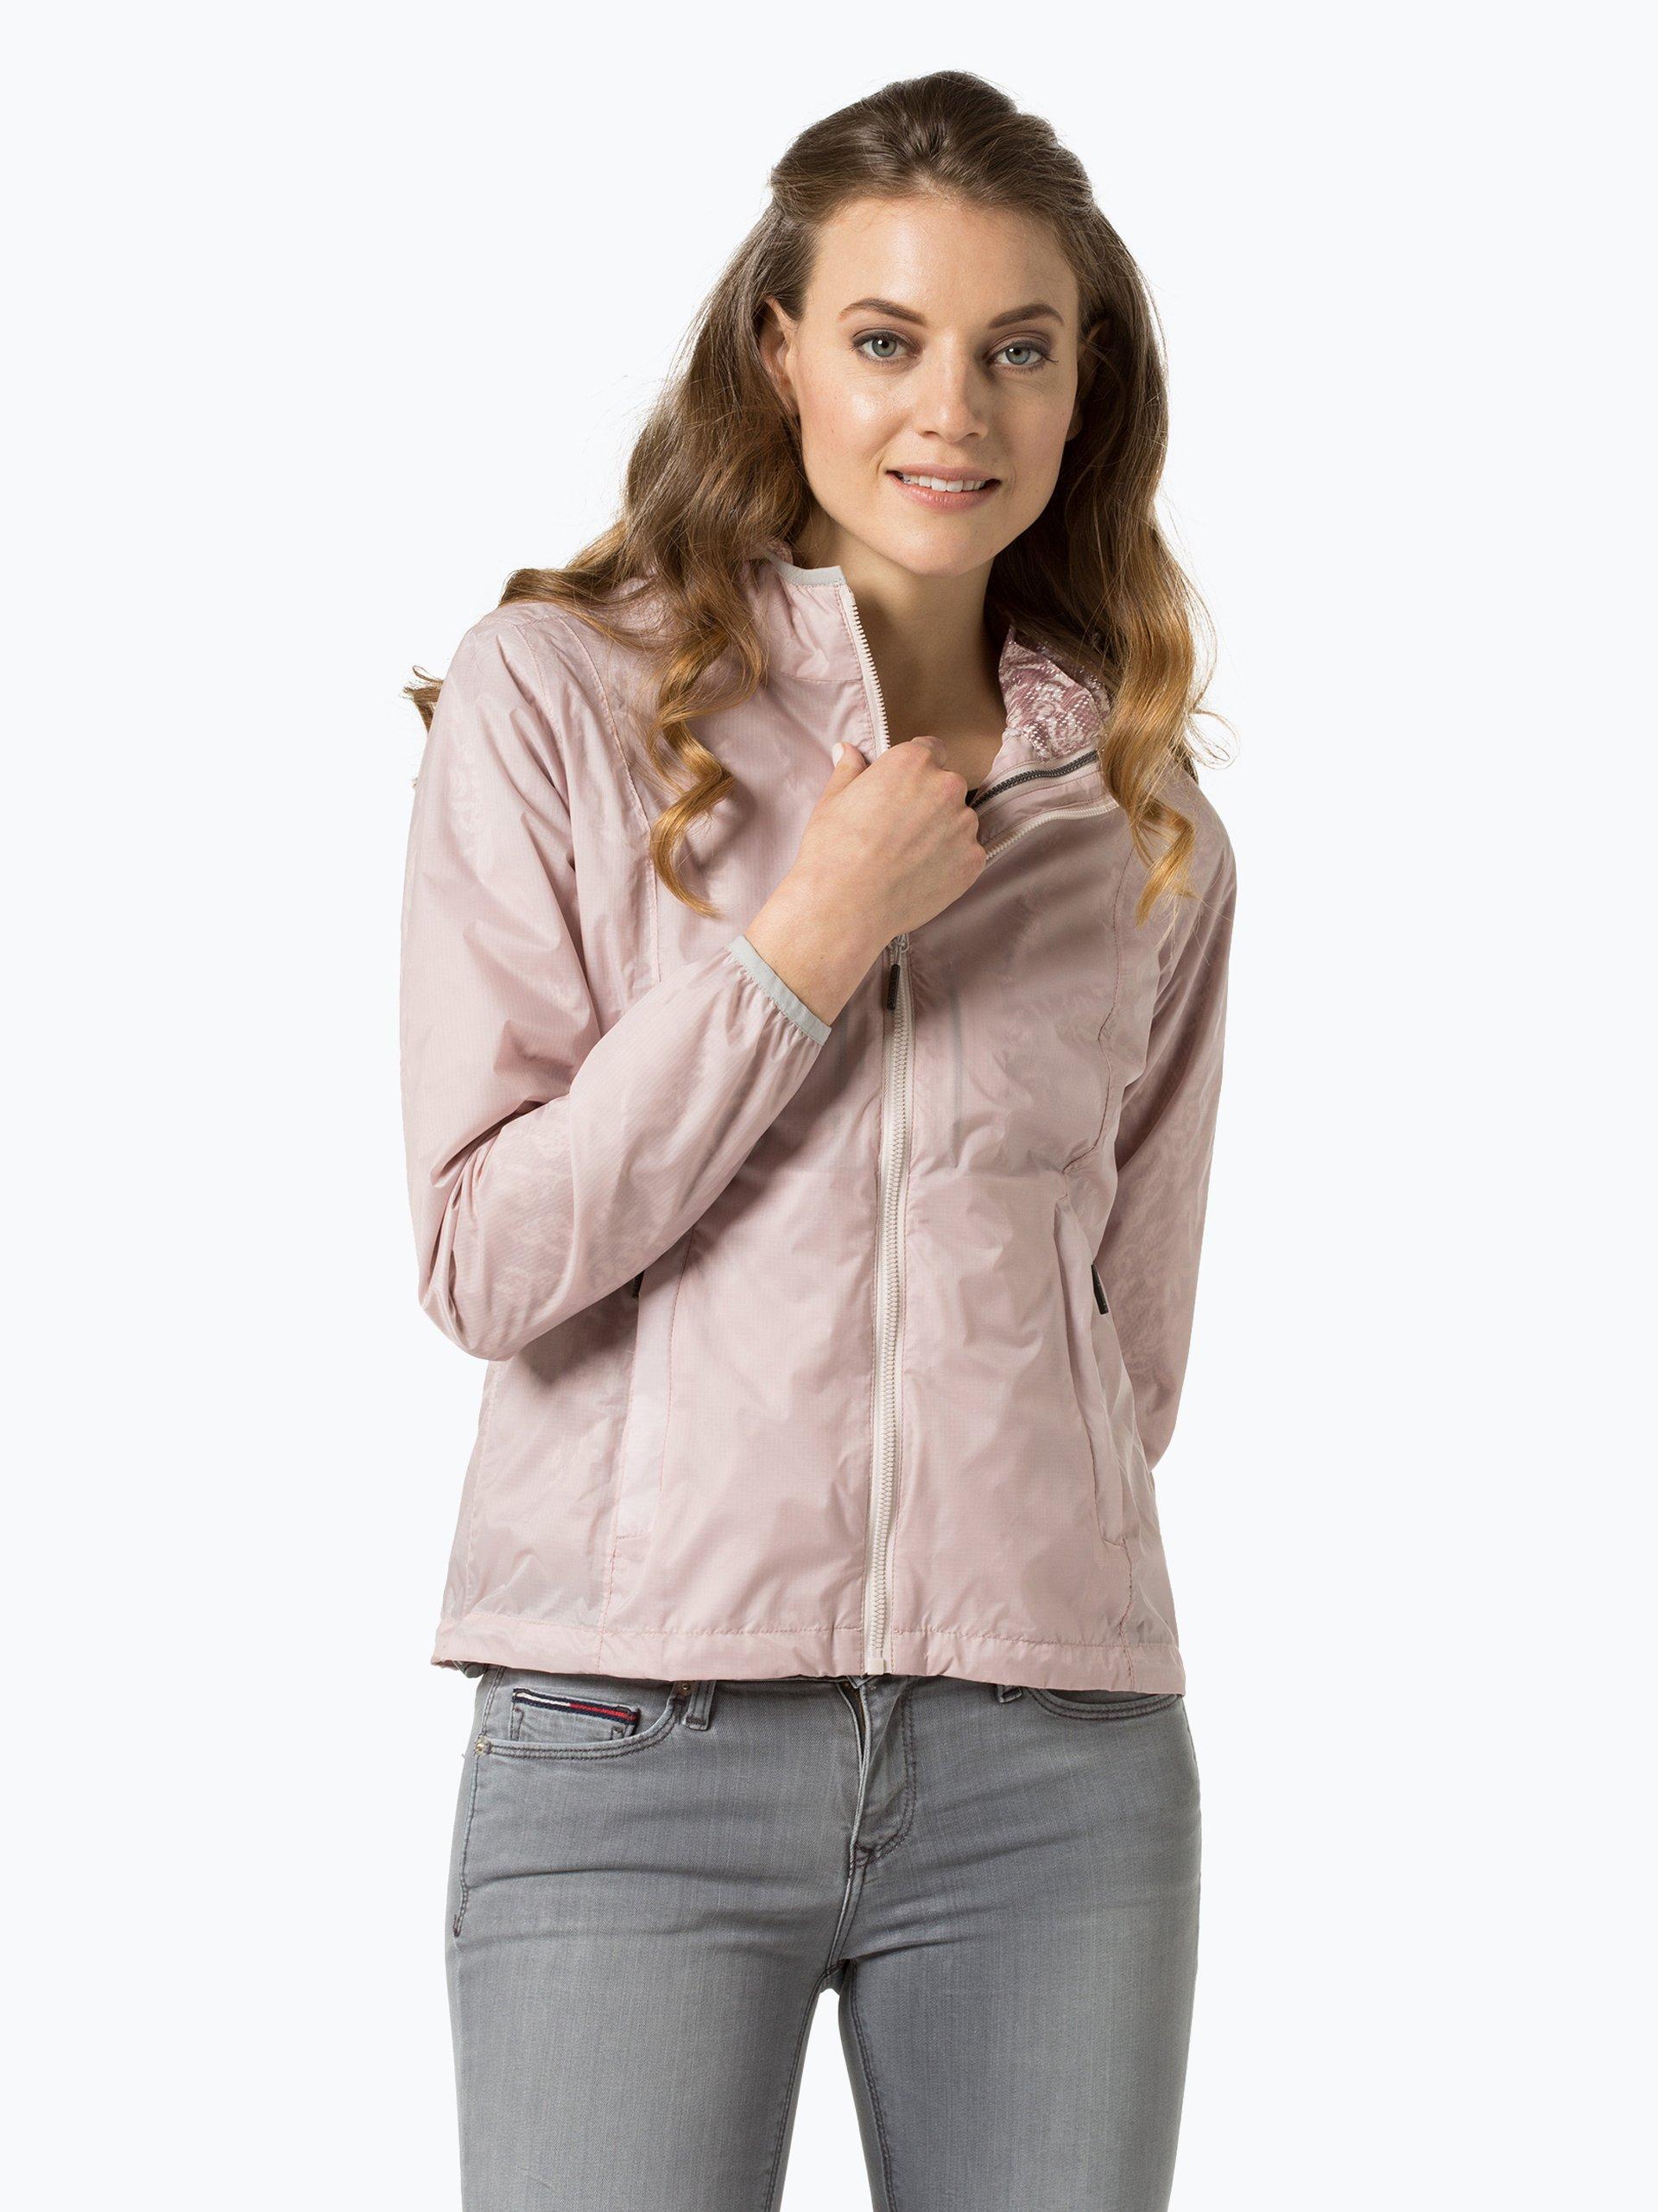 marie lund damen sportswear jacke rosa kariert online. Black Bedroom Furniture Sets. Home Design Ideas